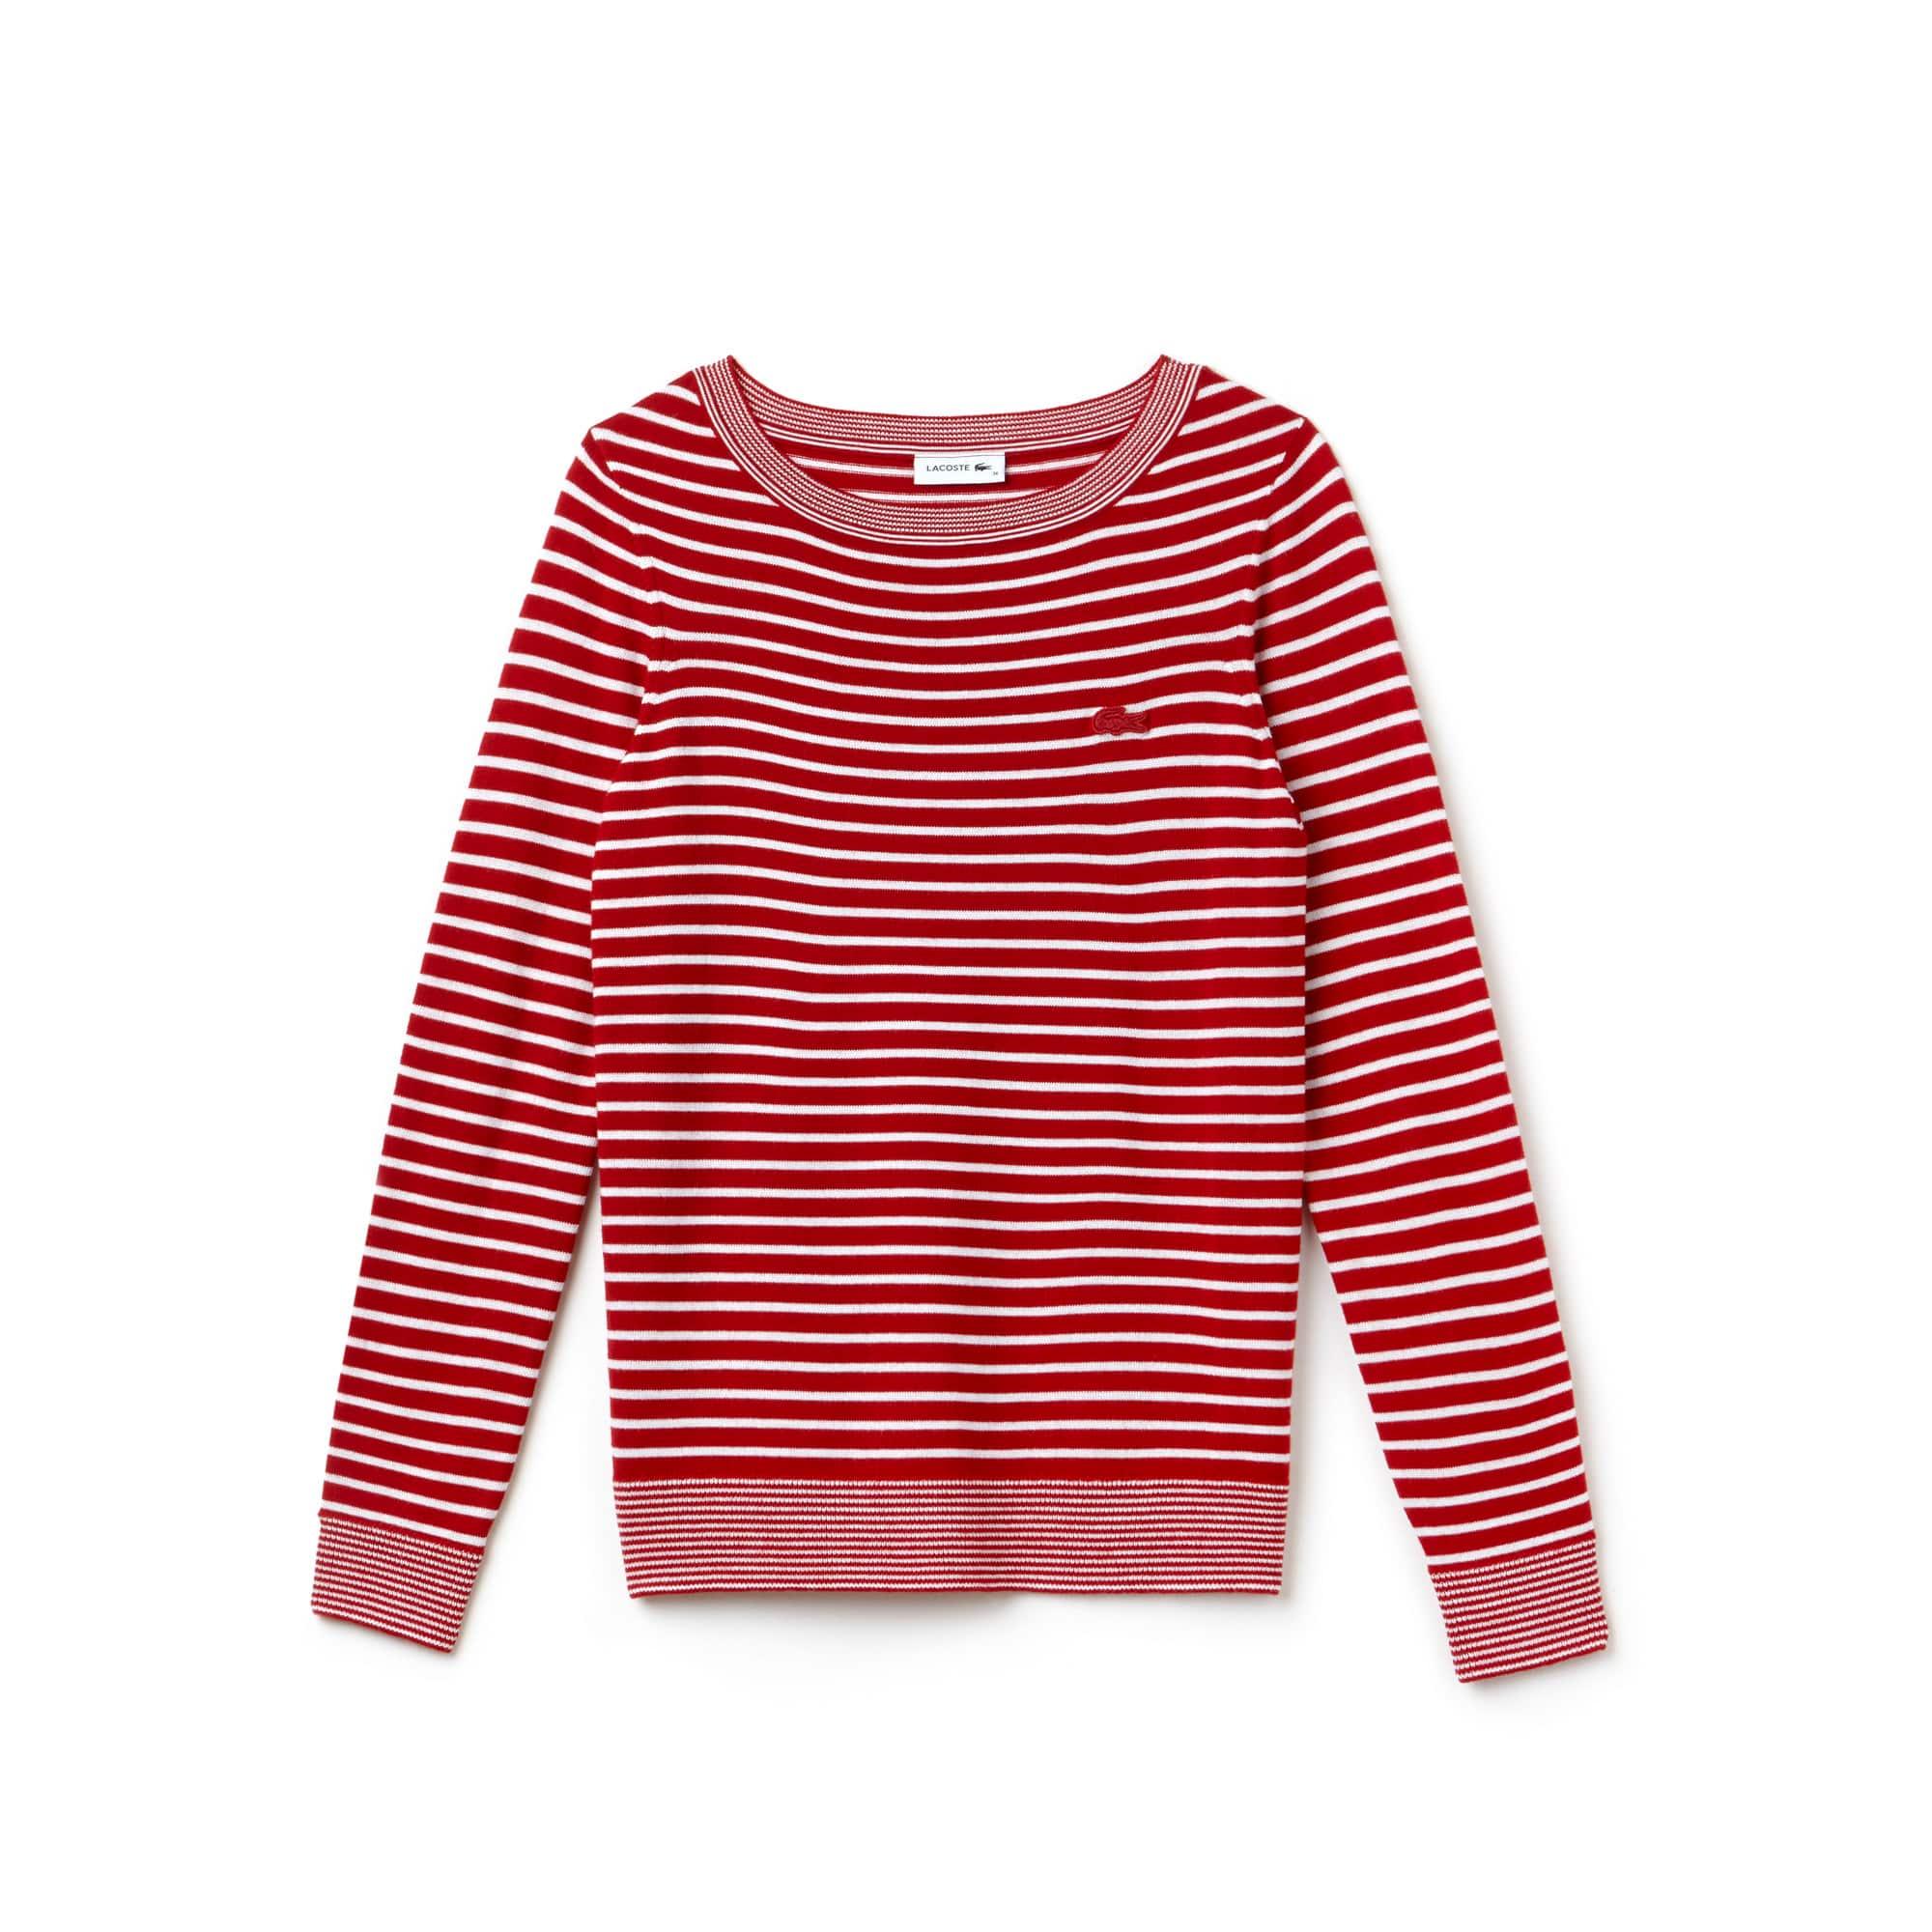 Women's Boat Neck Wool Blend Jersey Nautical Shirt